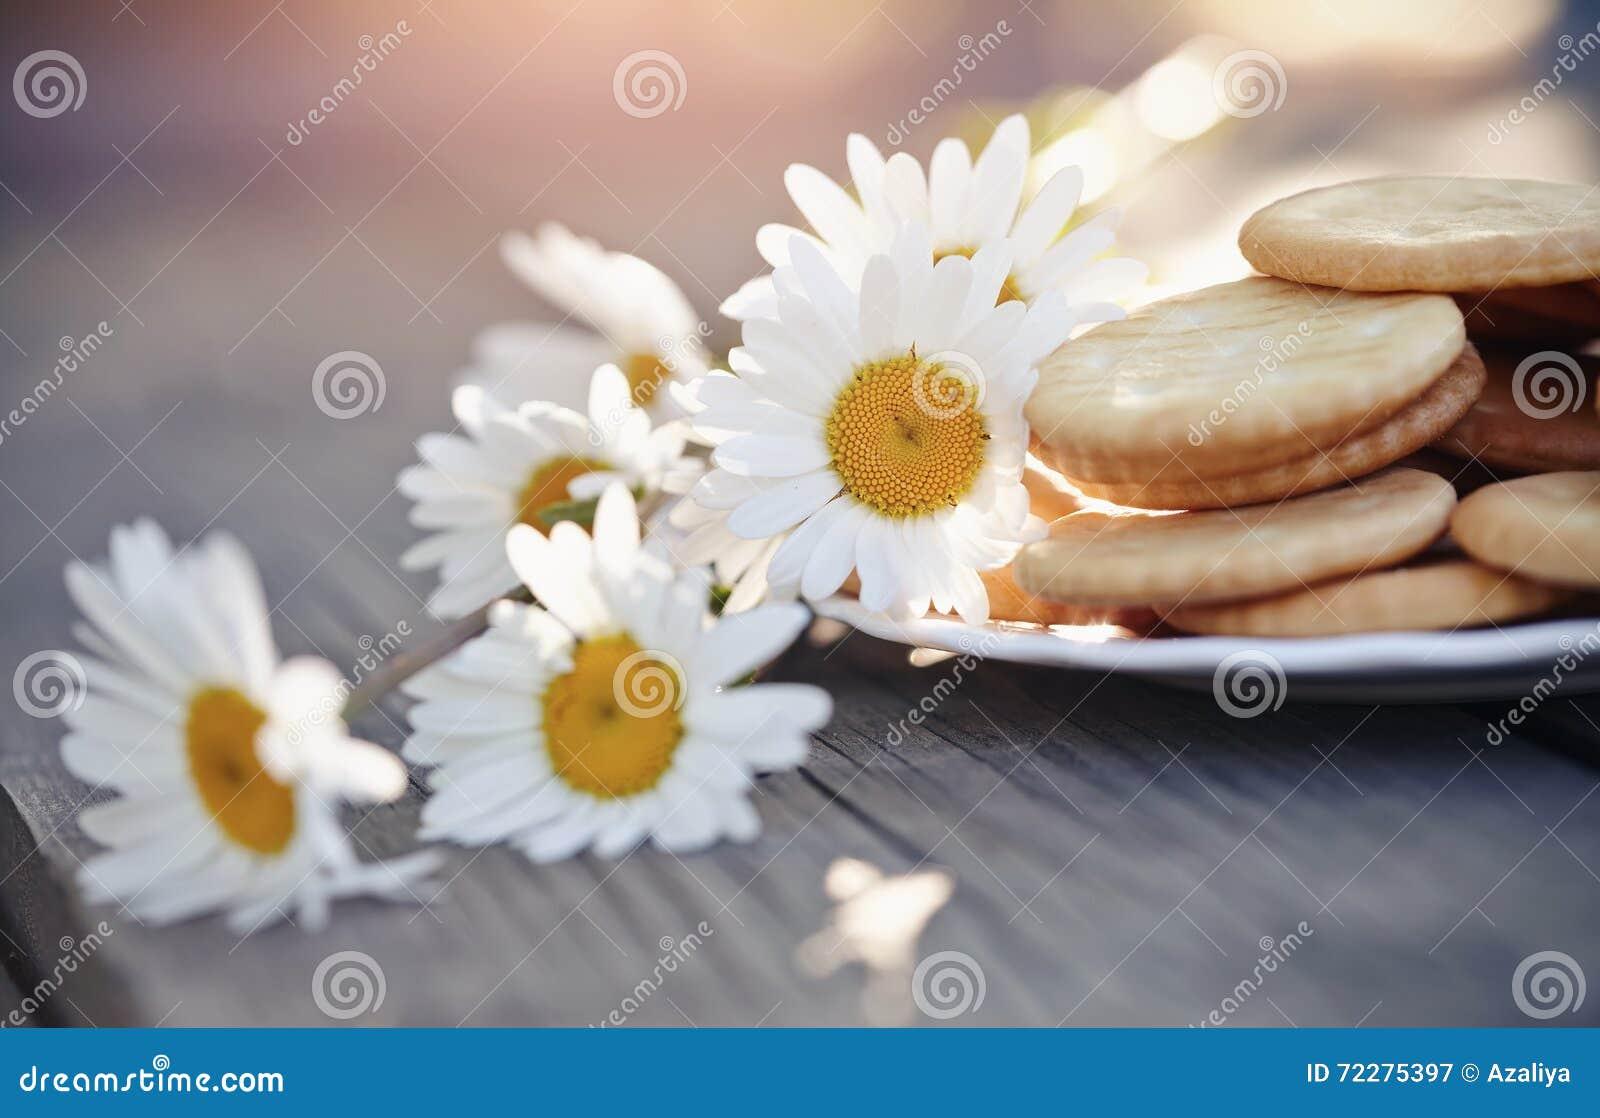 Download Печенья на плите и стоцвете Стоковое Изображение - изображение насчитывающей лепесток, завтраки: 72275397